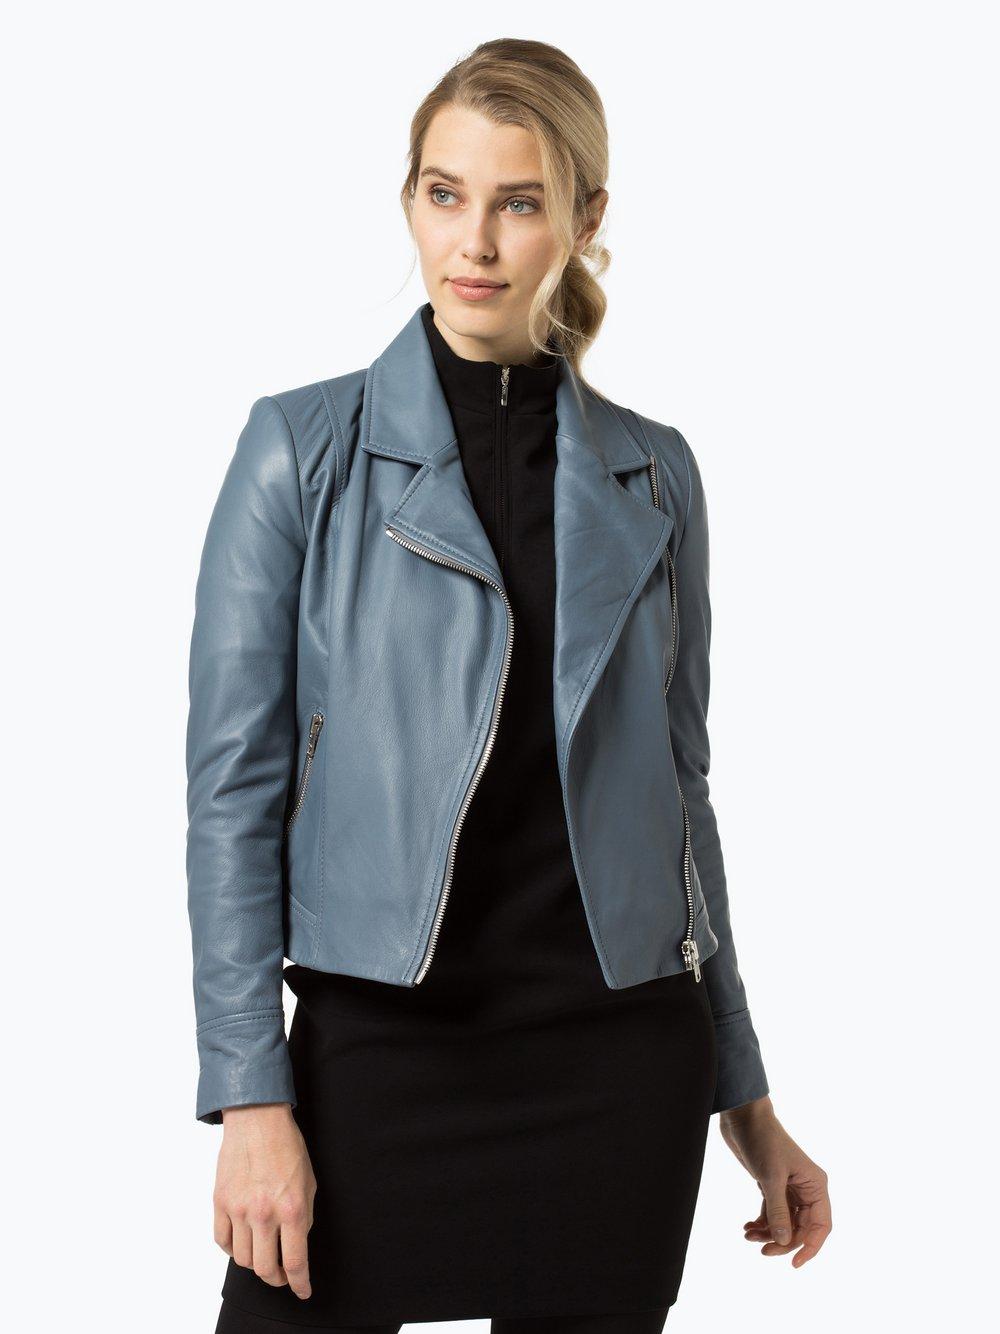 new style 8ae96 bbf6e Drykorn Damen Lederjacke - Ceylon online kaufen | PEEK-UND ...